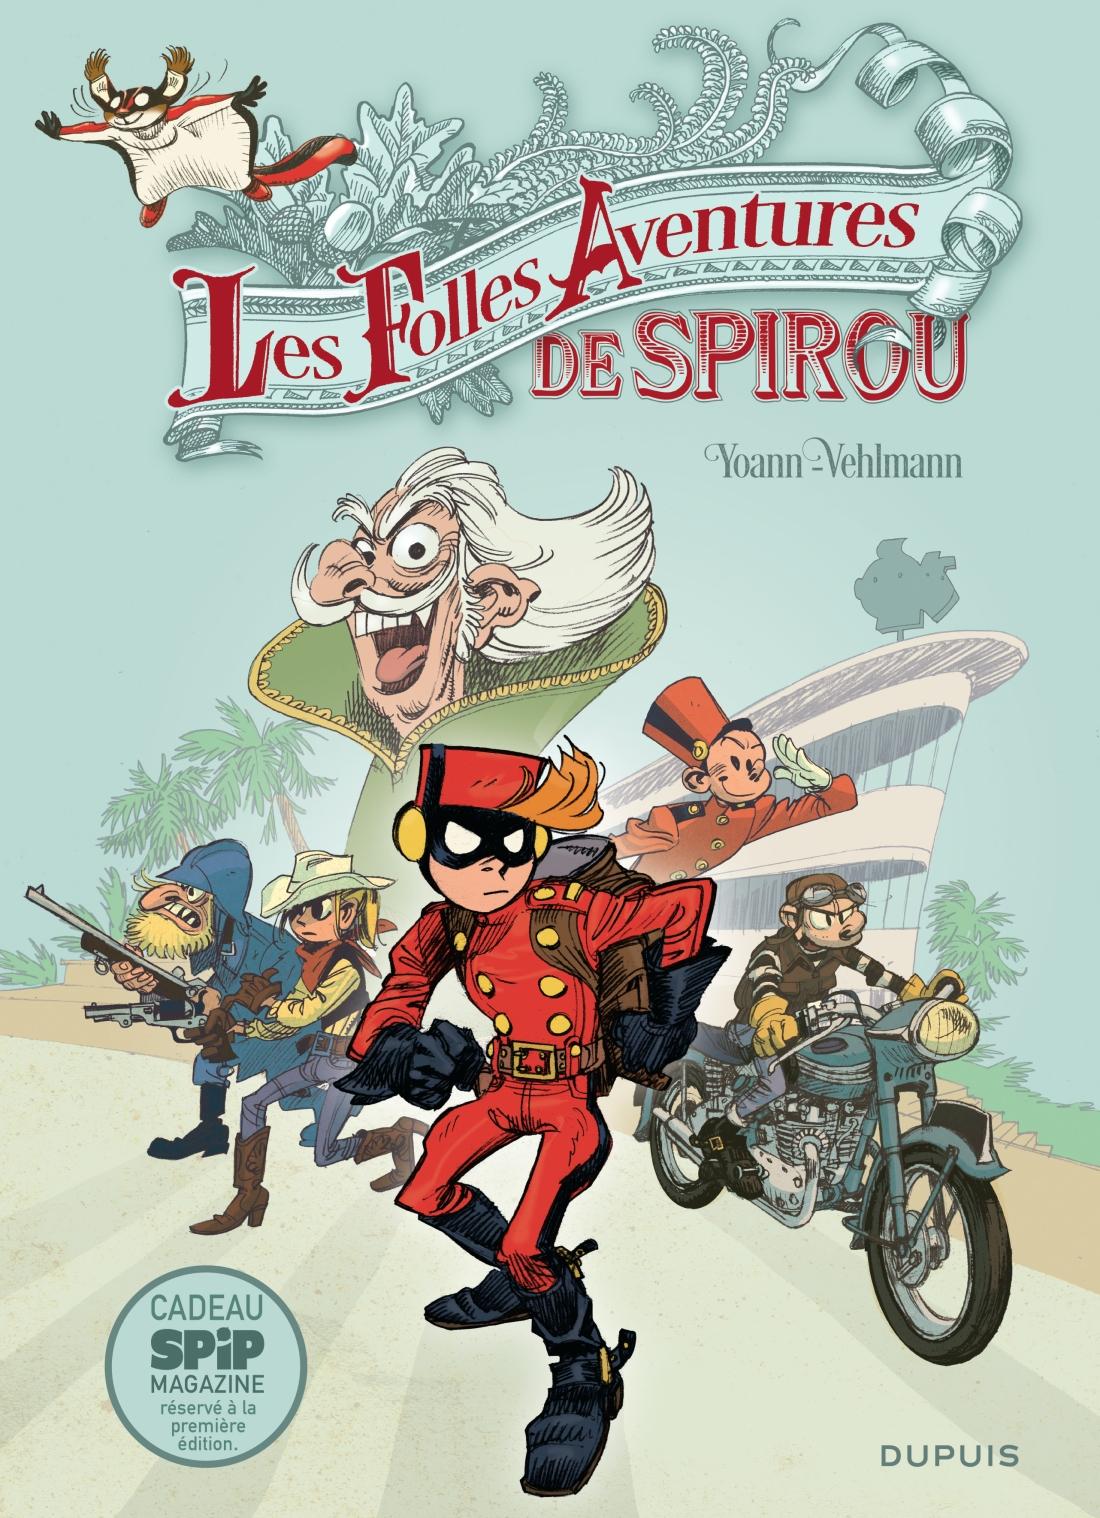 Les folles aventures de Spirou - omslag.jpg